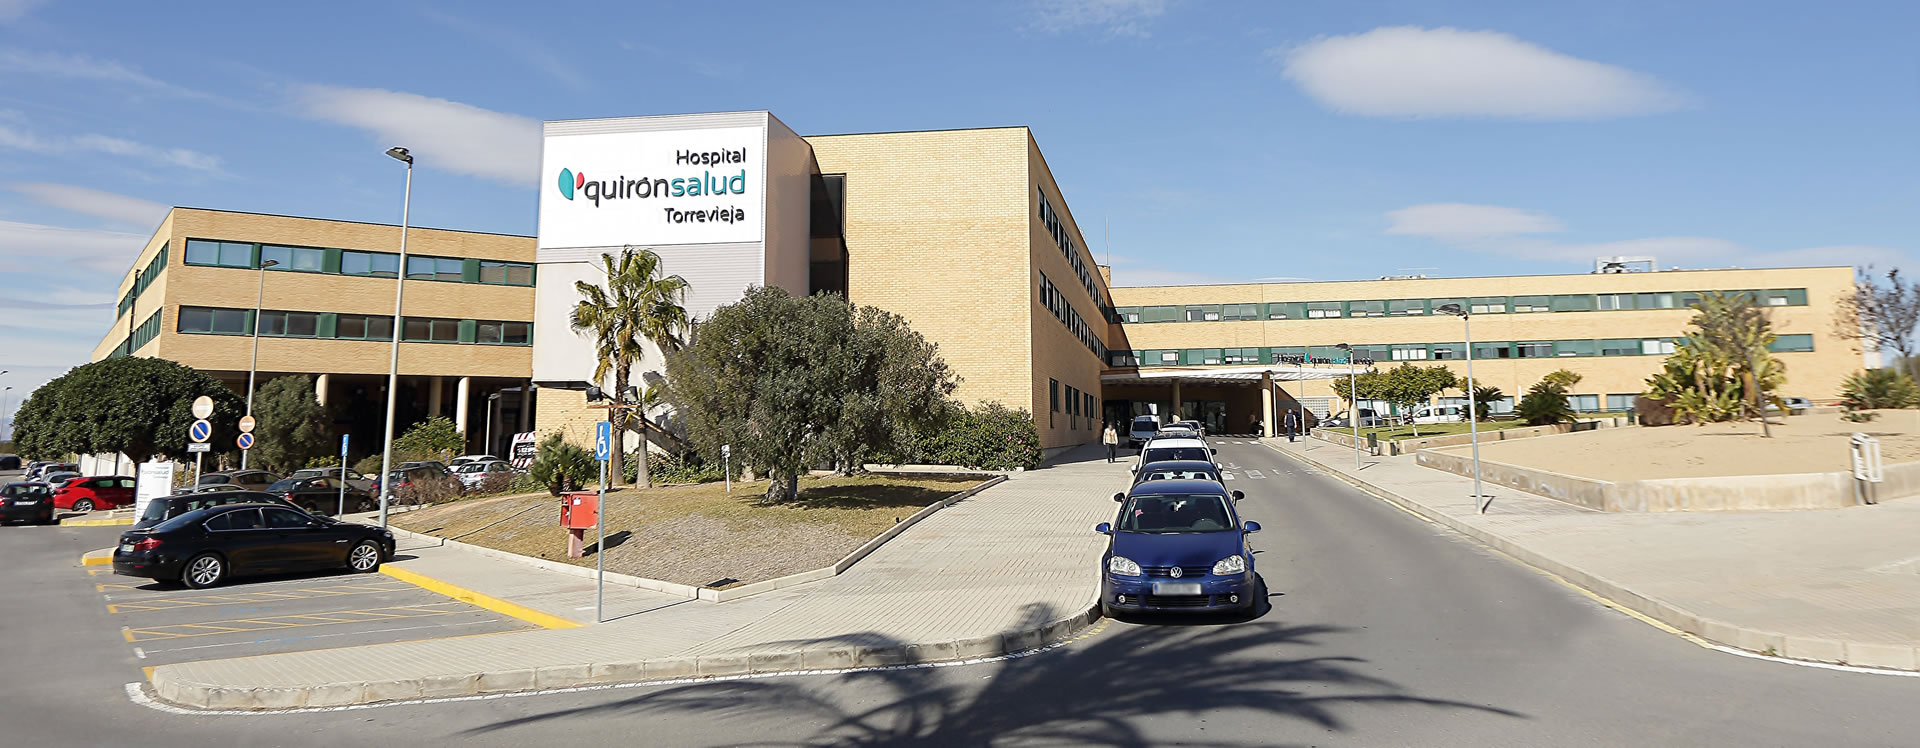 Exterior del Hospital Quirónsalud Torrevieja donde se encuentra localizada la clínica dental Marta Vallés